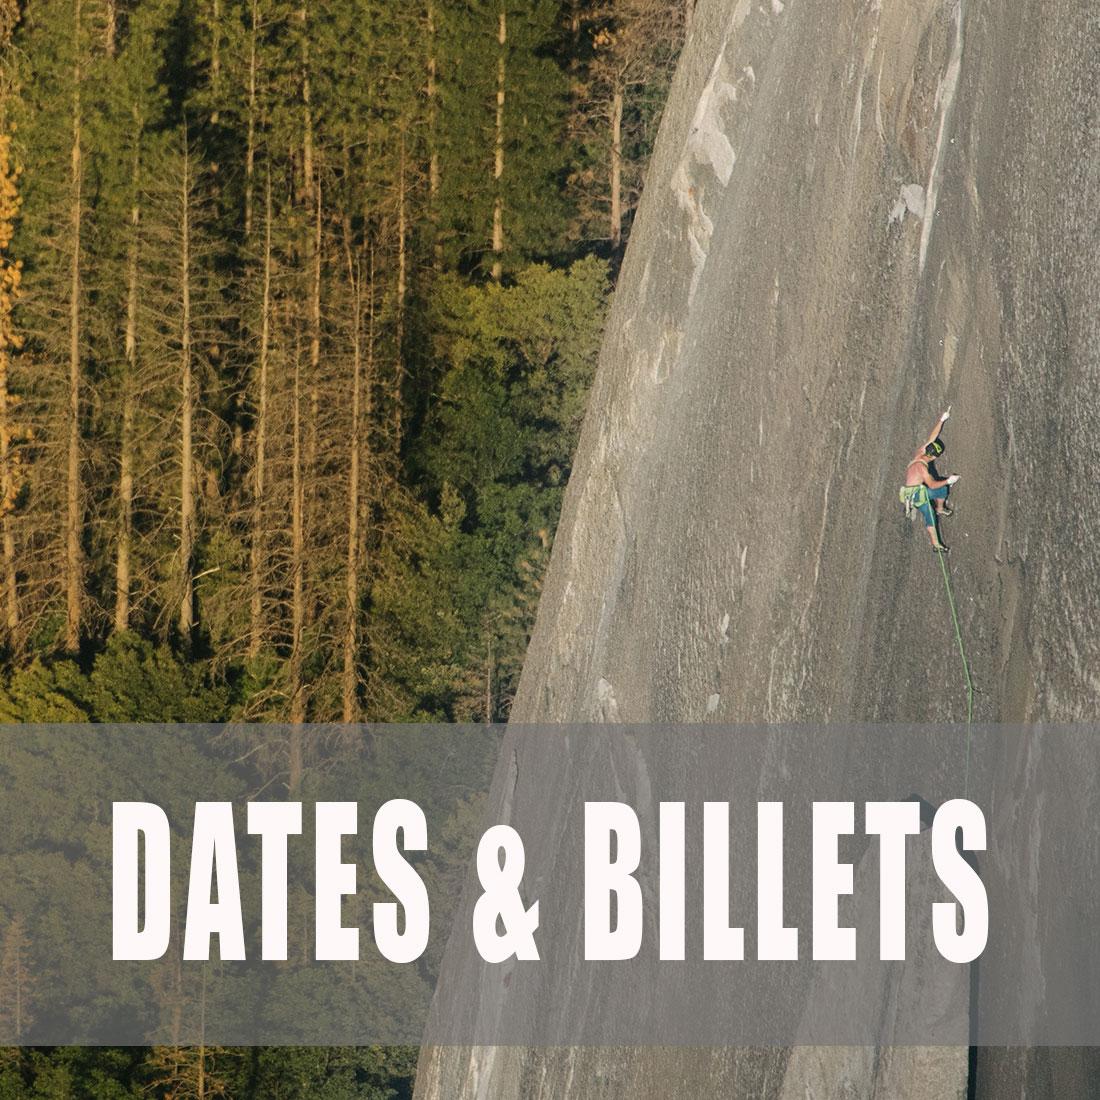 Date-billet